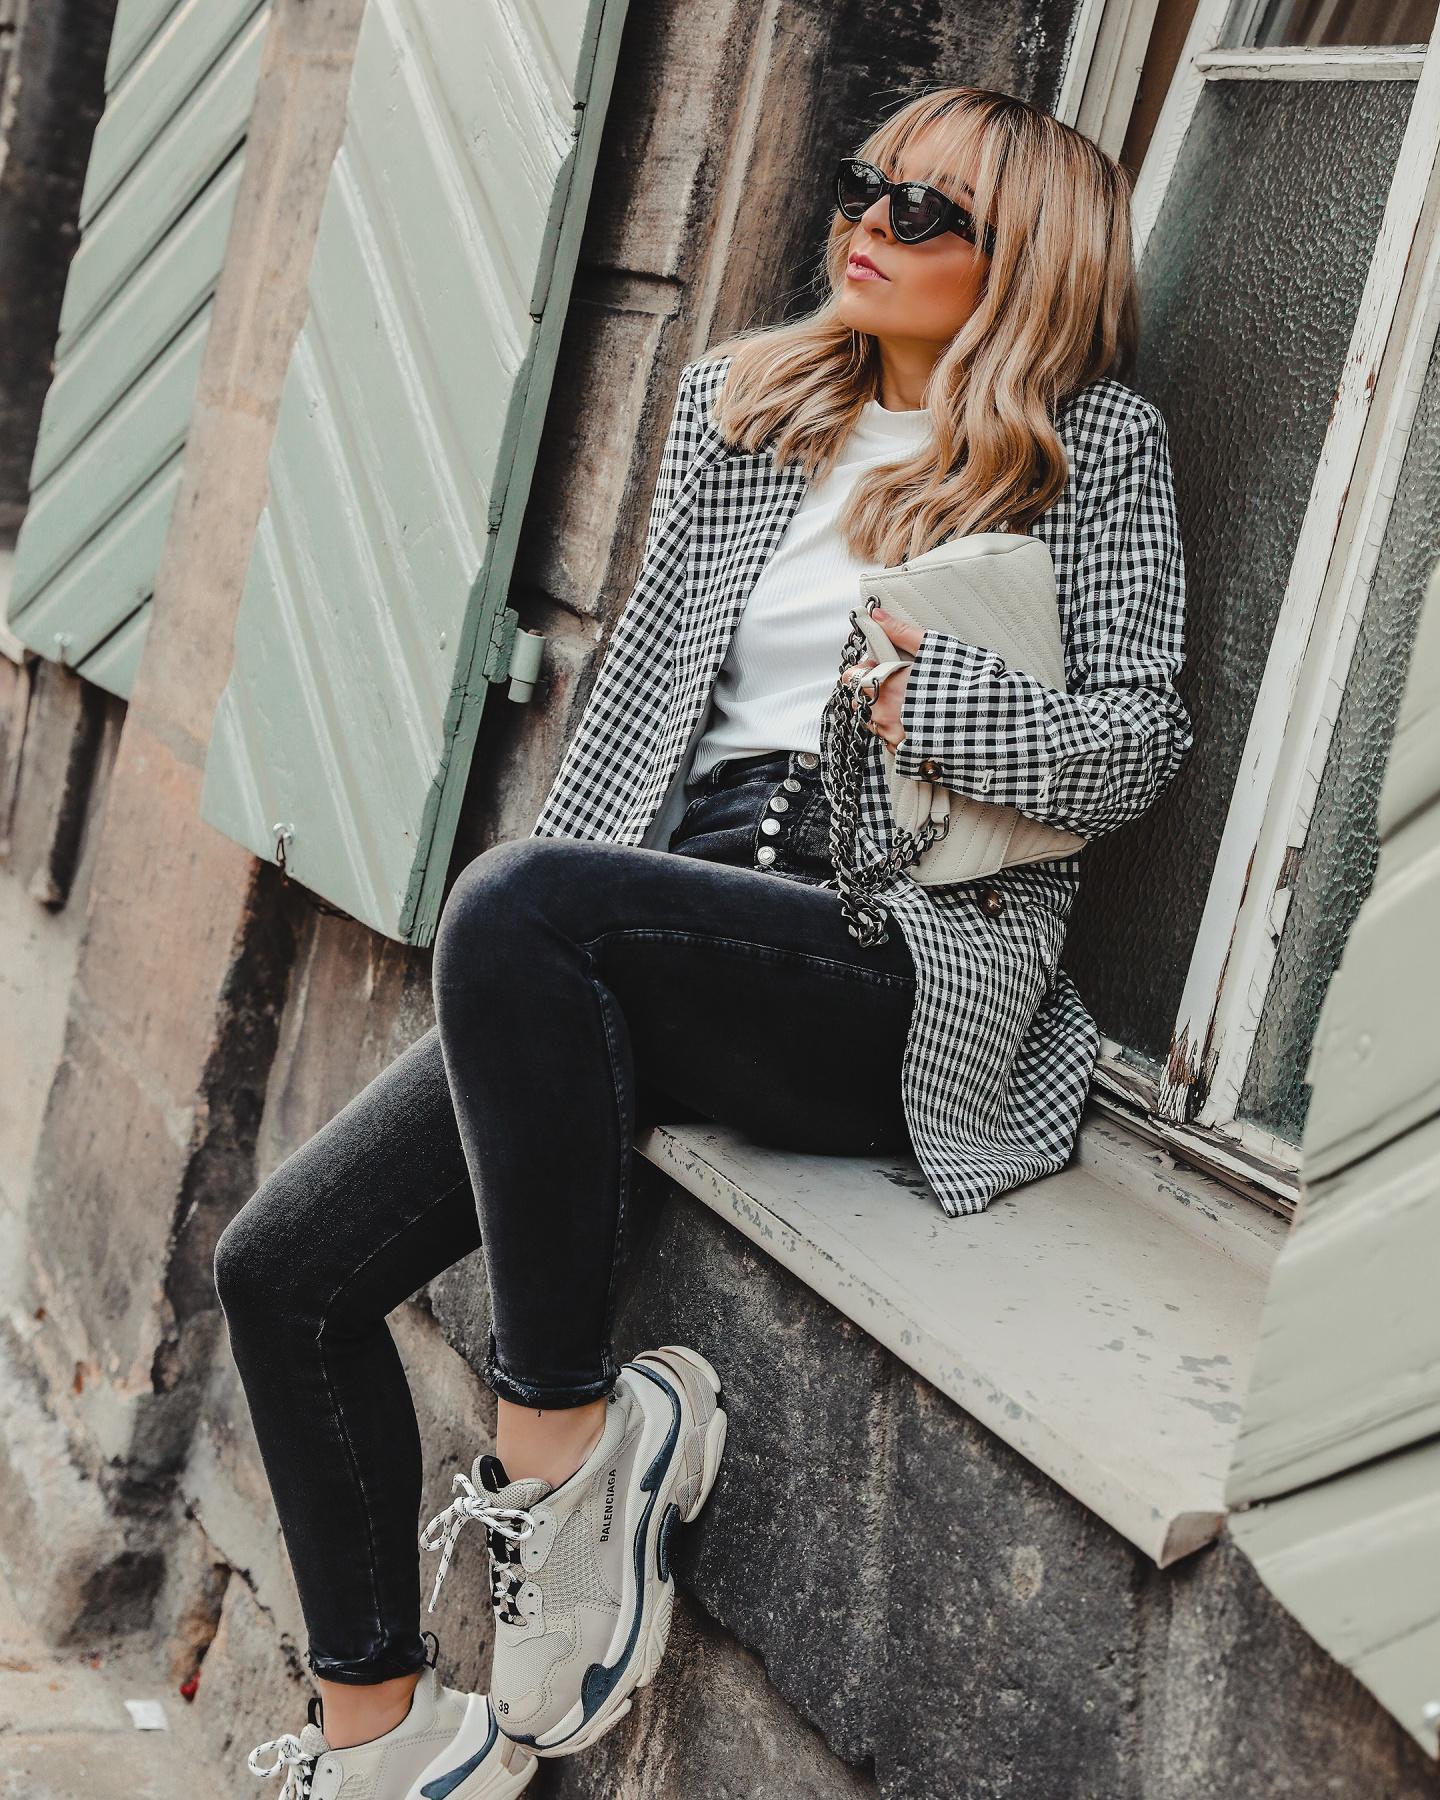 5 Balenciaga Triple S Outfit Ideas